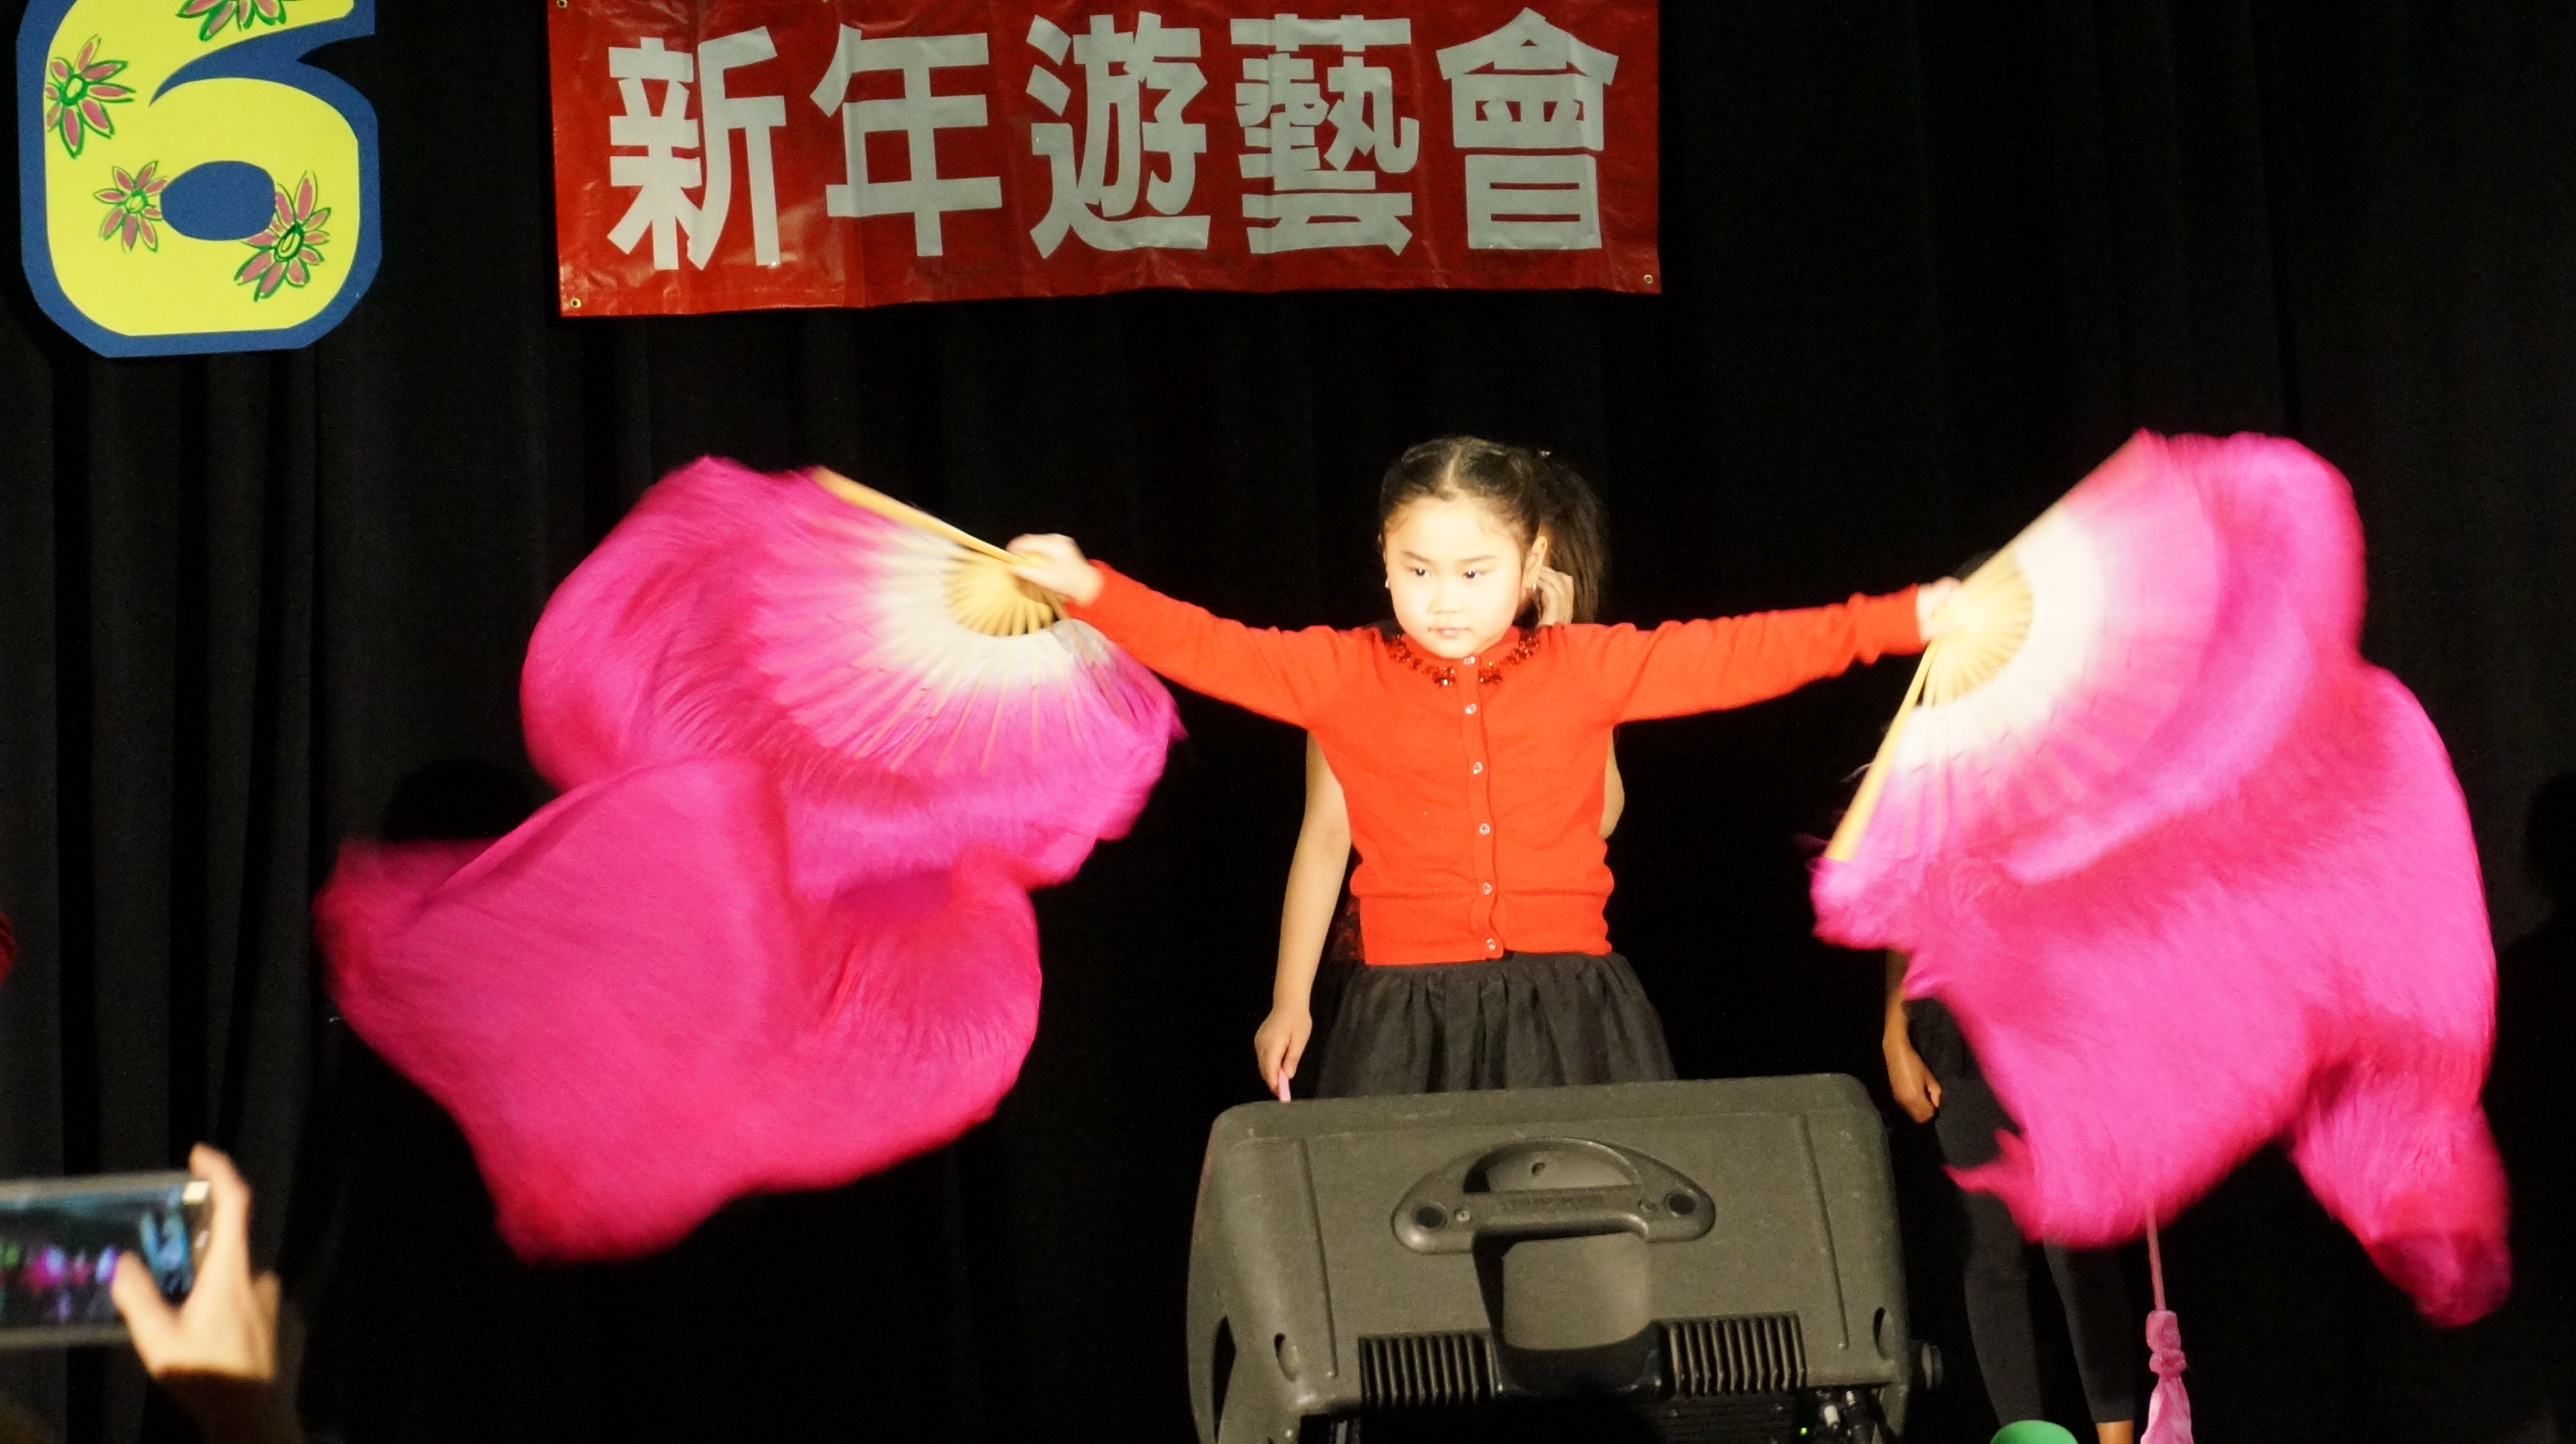 1cfde695c295635f8308_aaa_Chinese_New_Year_pix_4.JPG